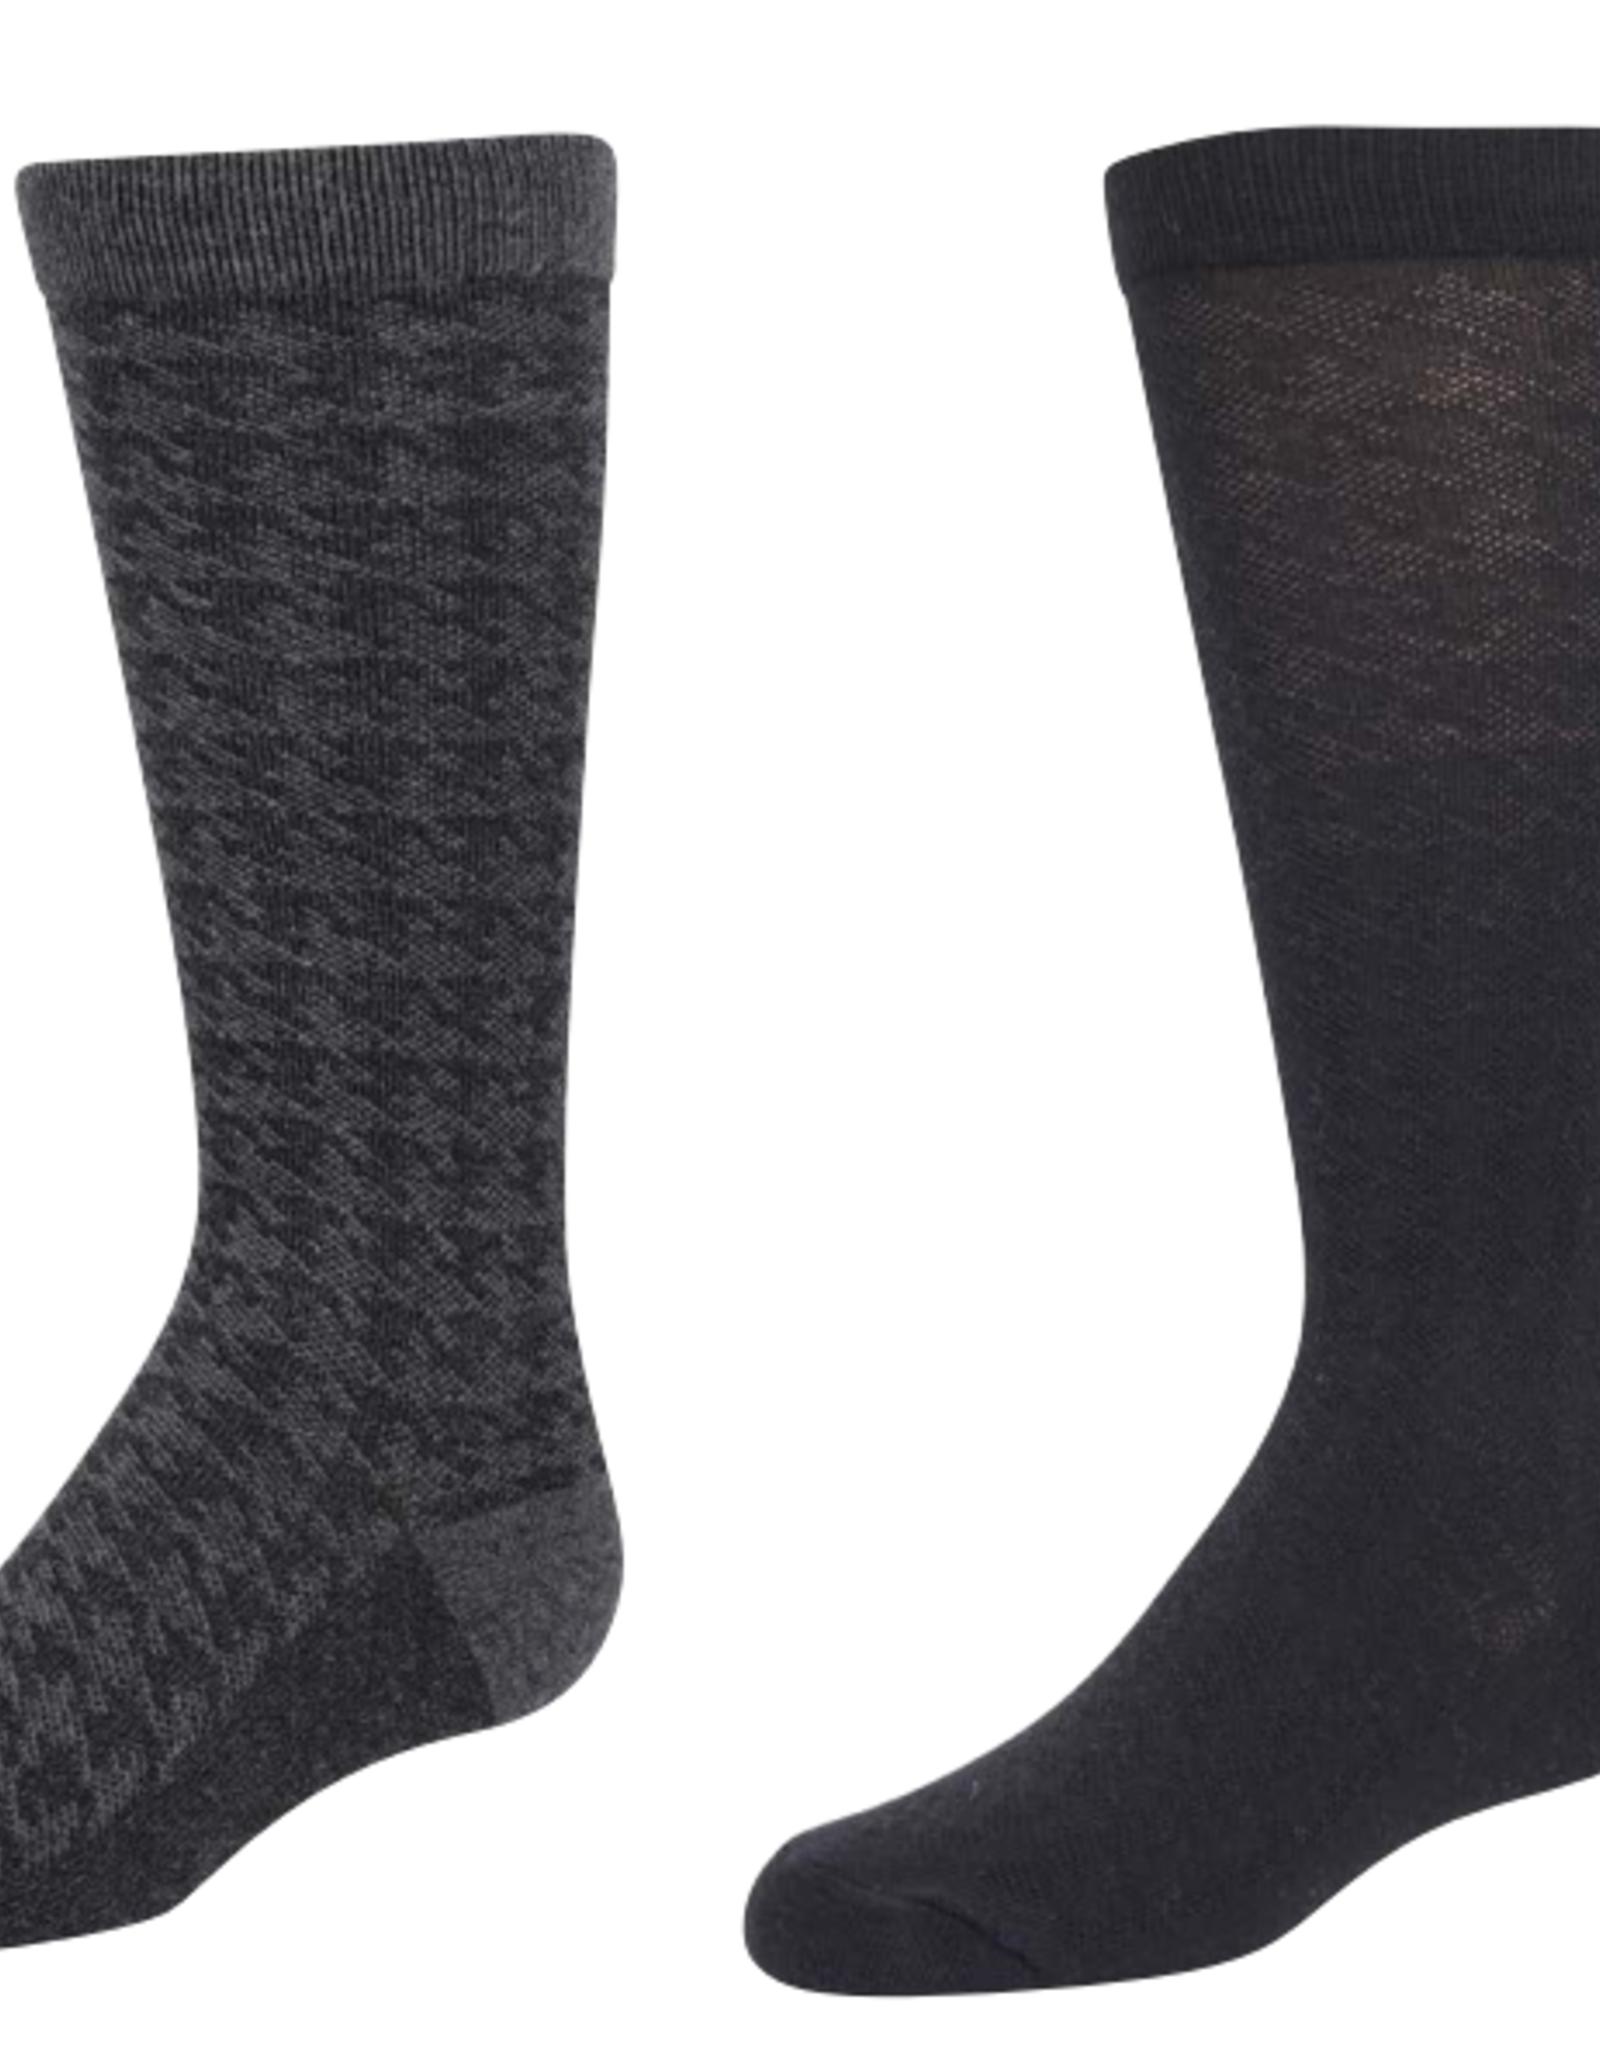 Zubii Zubii Houndstooth Texture Knee Sock